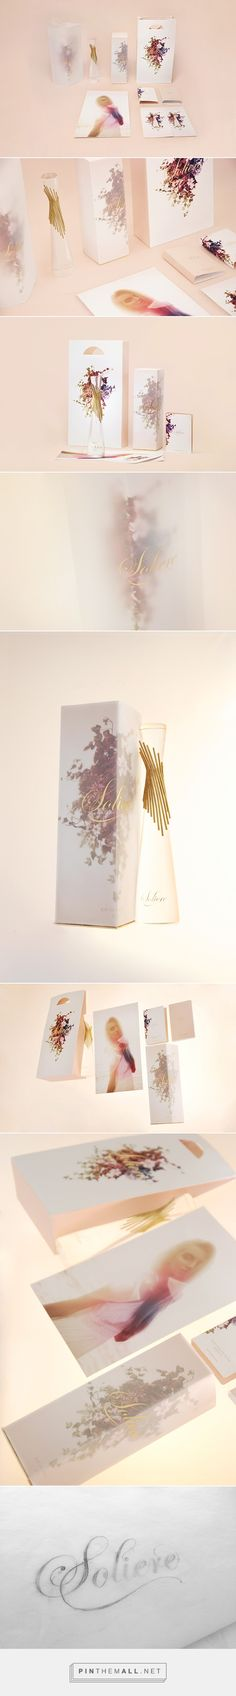 Soliere Perfume Branding on Behance | Fivestar Branding – Design and Branding Agency & Inspiration Gallery